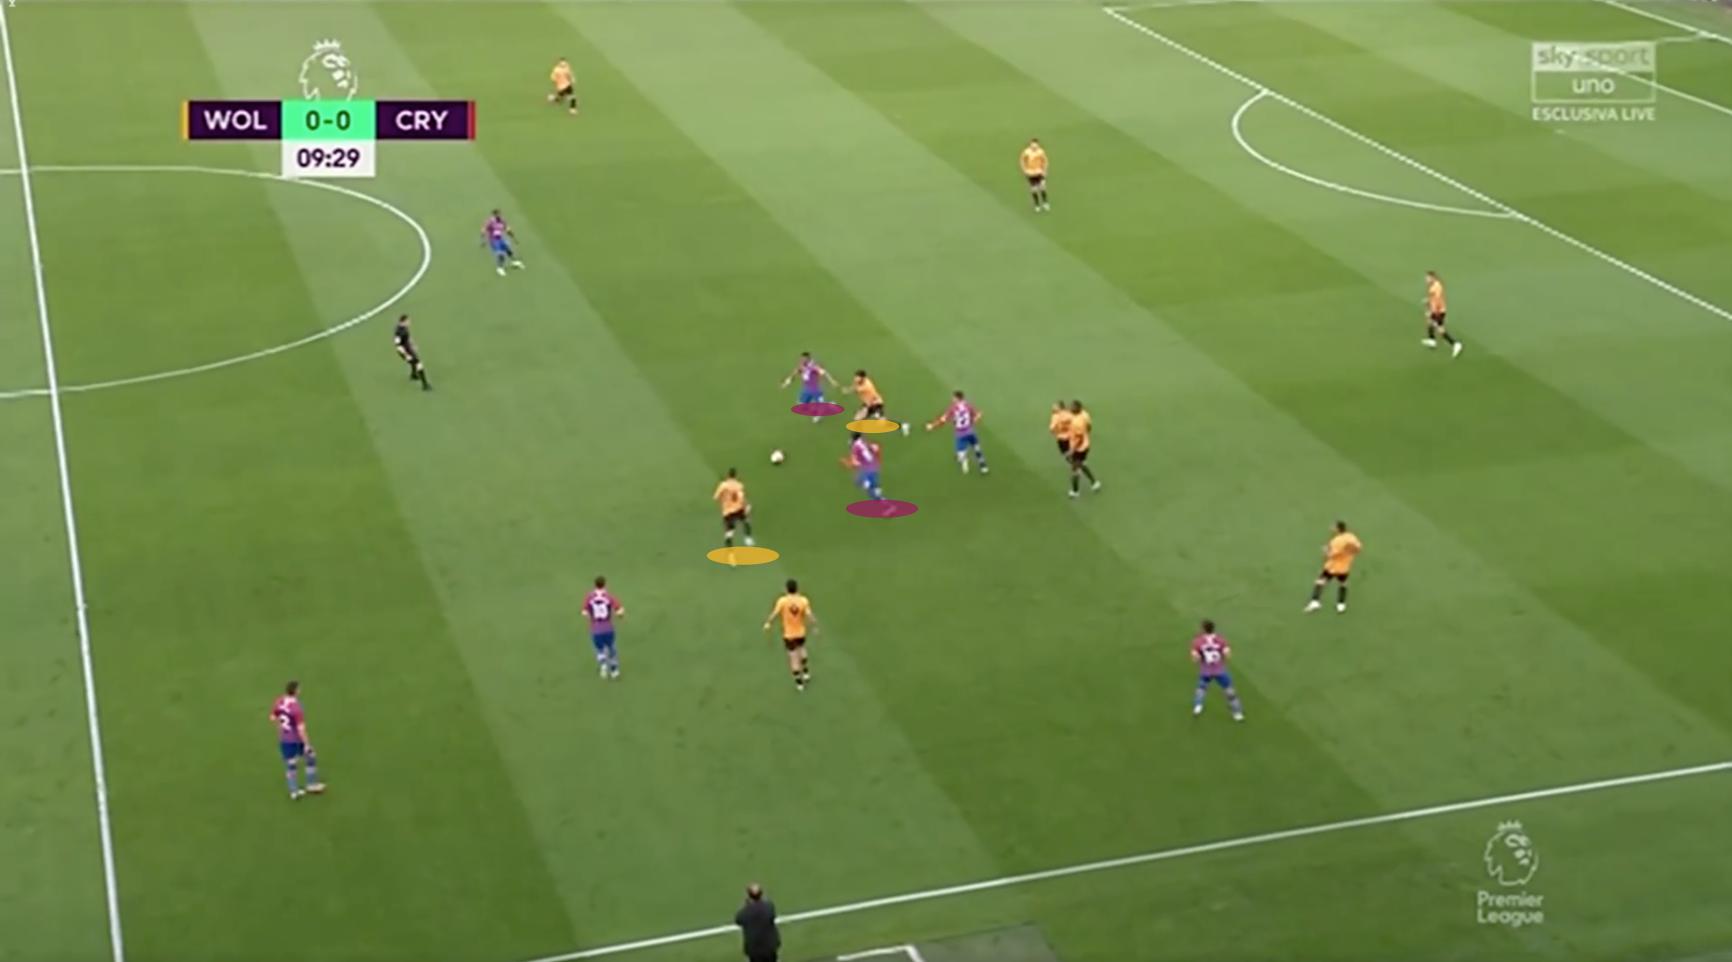 Premier League 2019/20: Wolverhampton Wanderers vs Crystal Palace - tactical analysis tactics